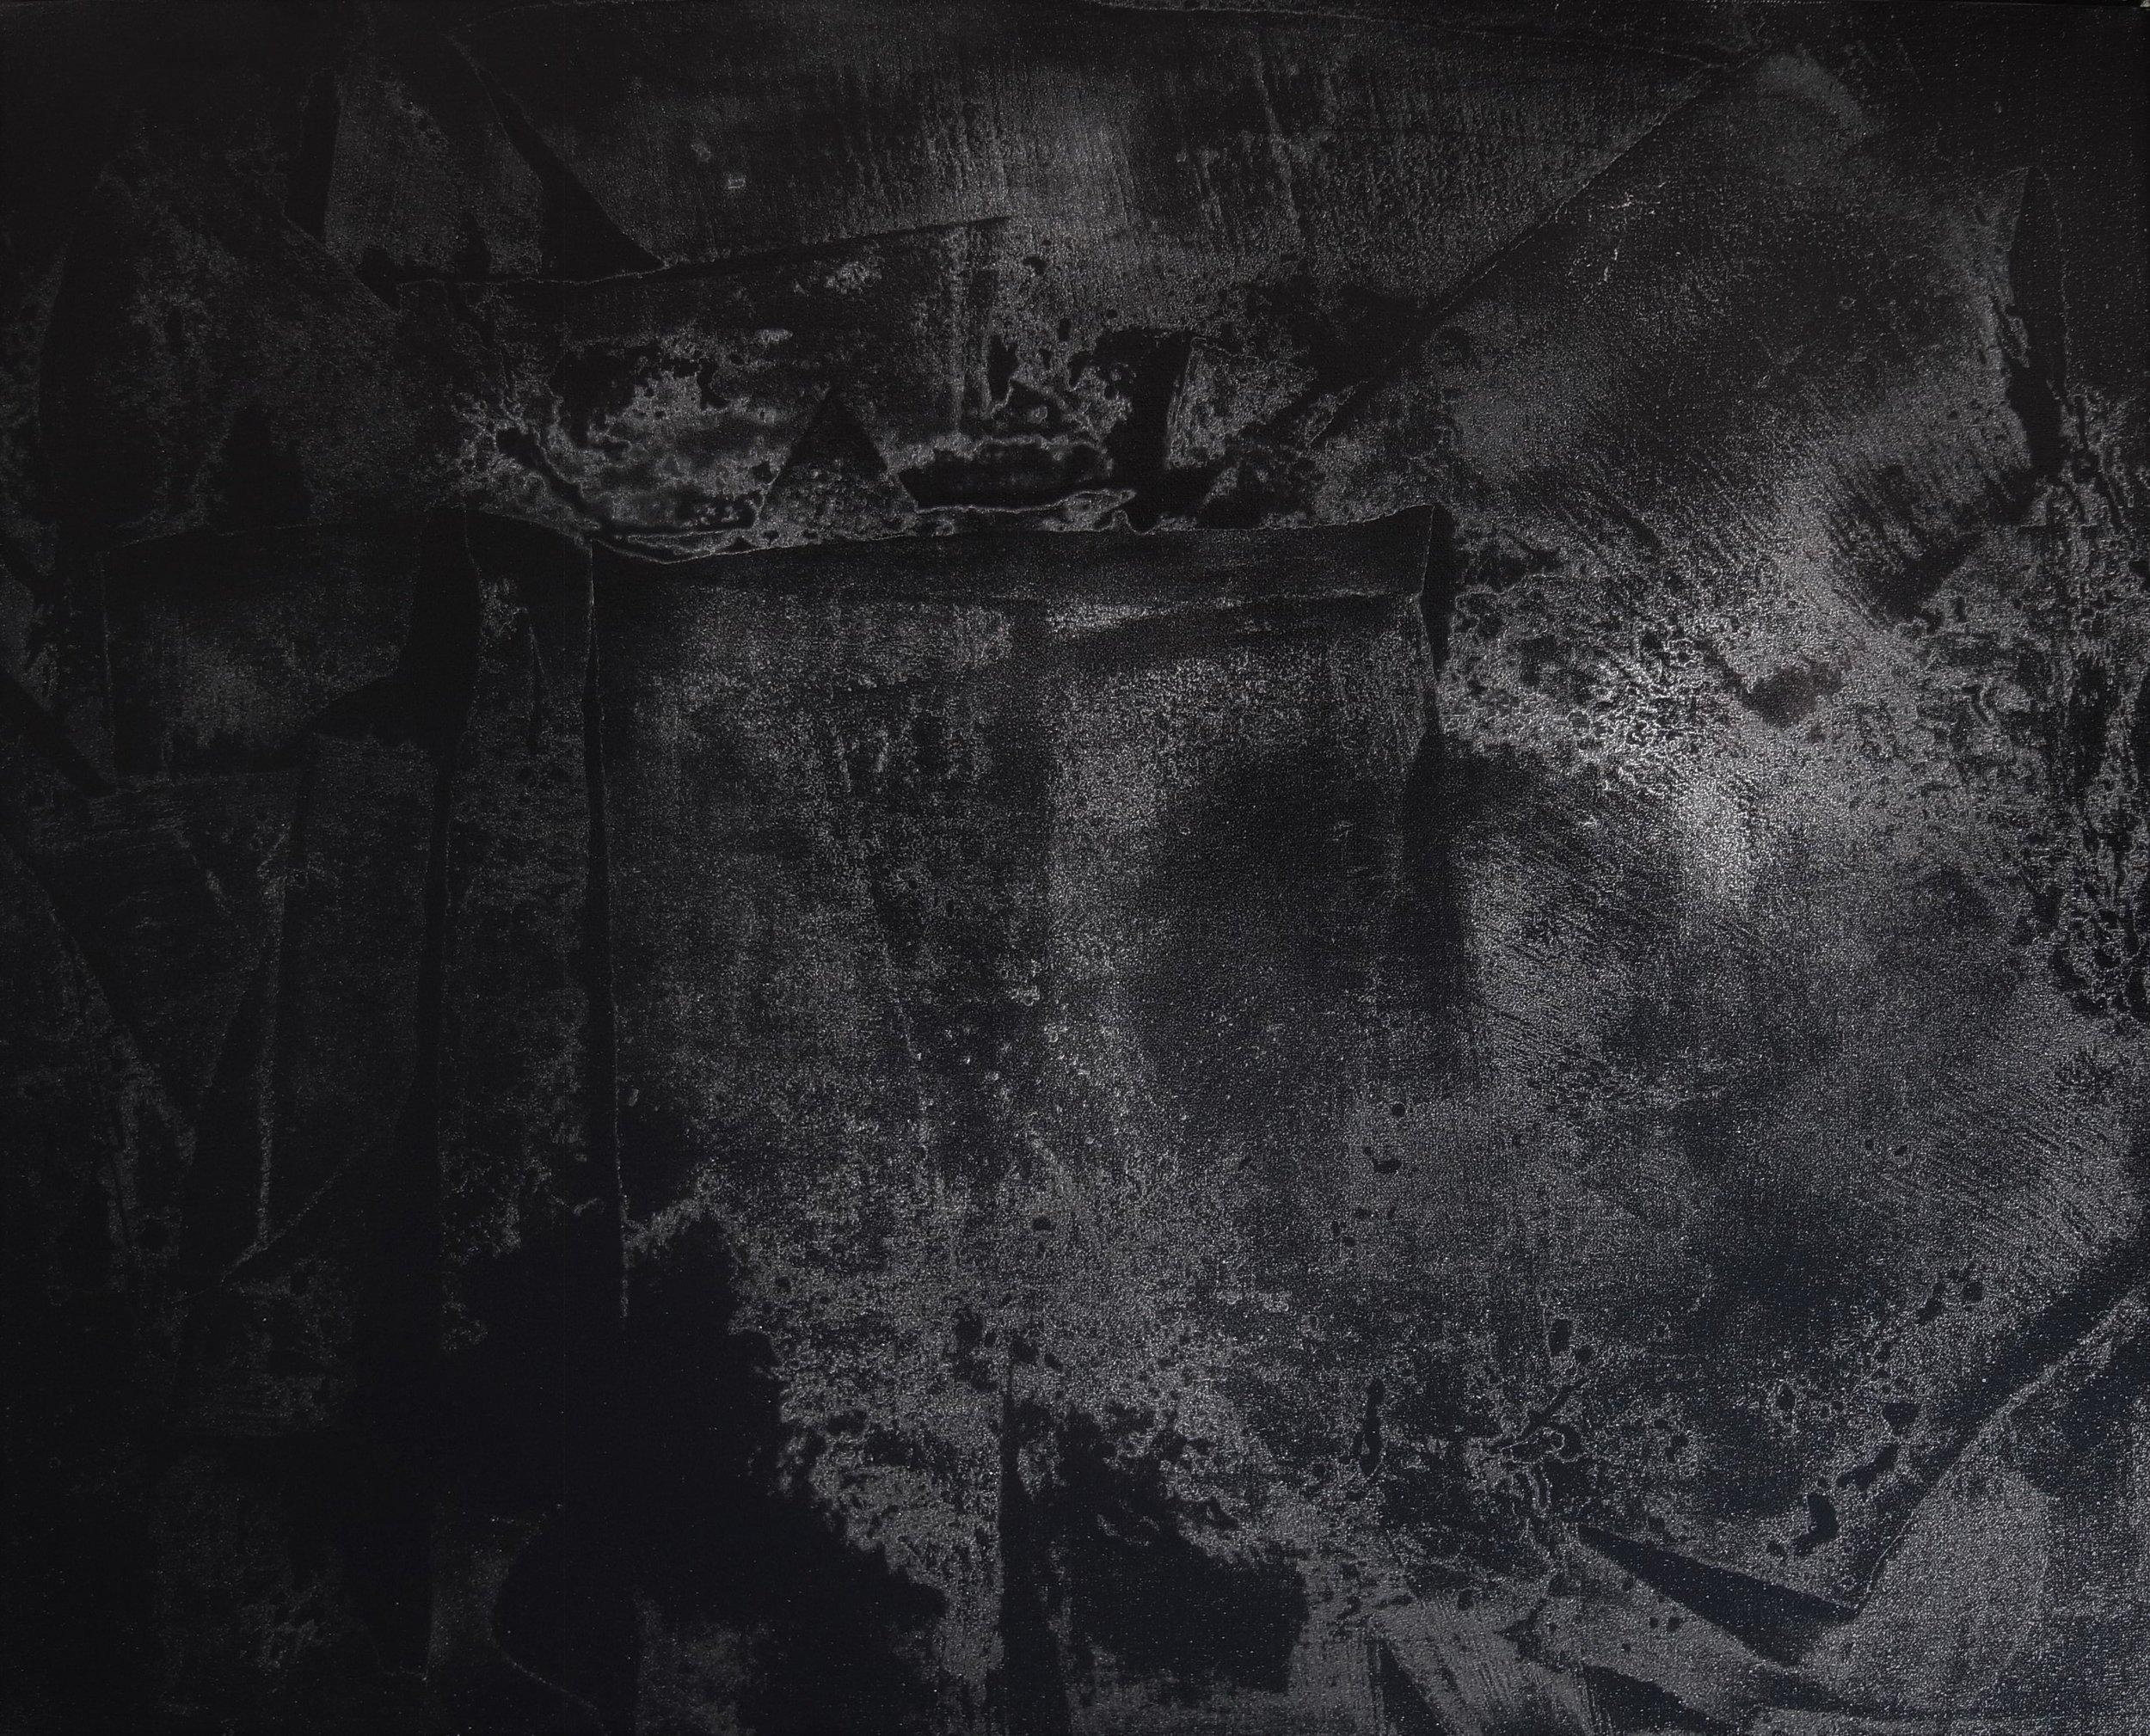 Black Void No. 12, 2016, 100cm x 80cm 40F, Oil on Canvas.JPG